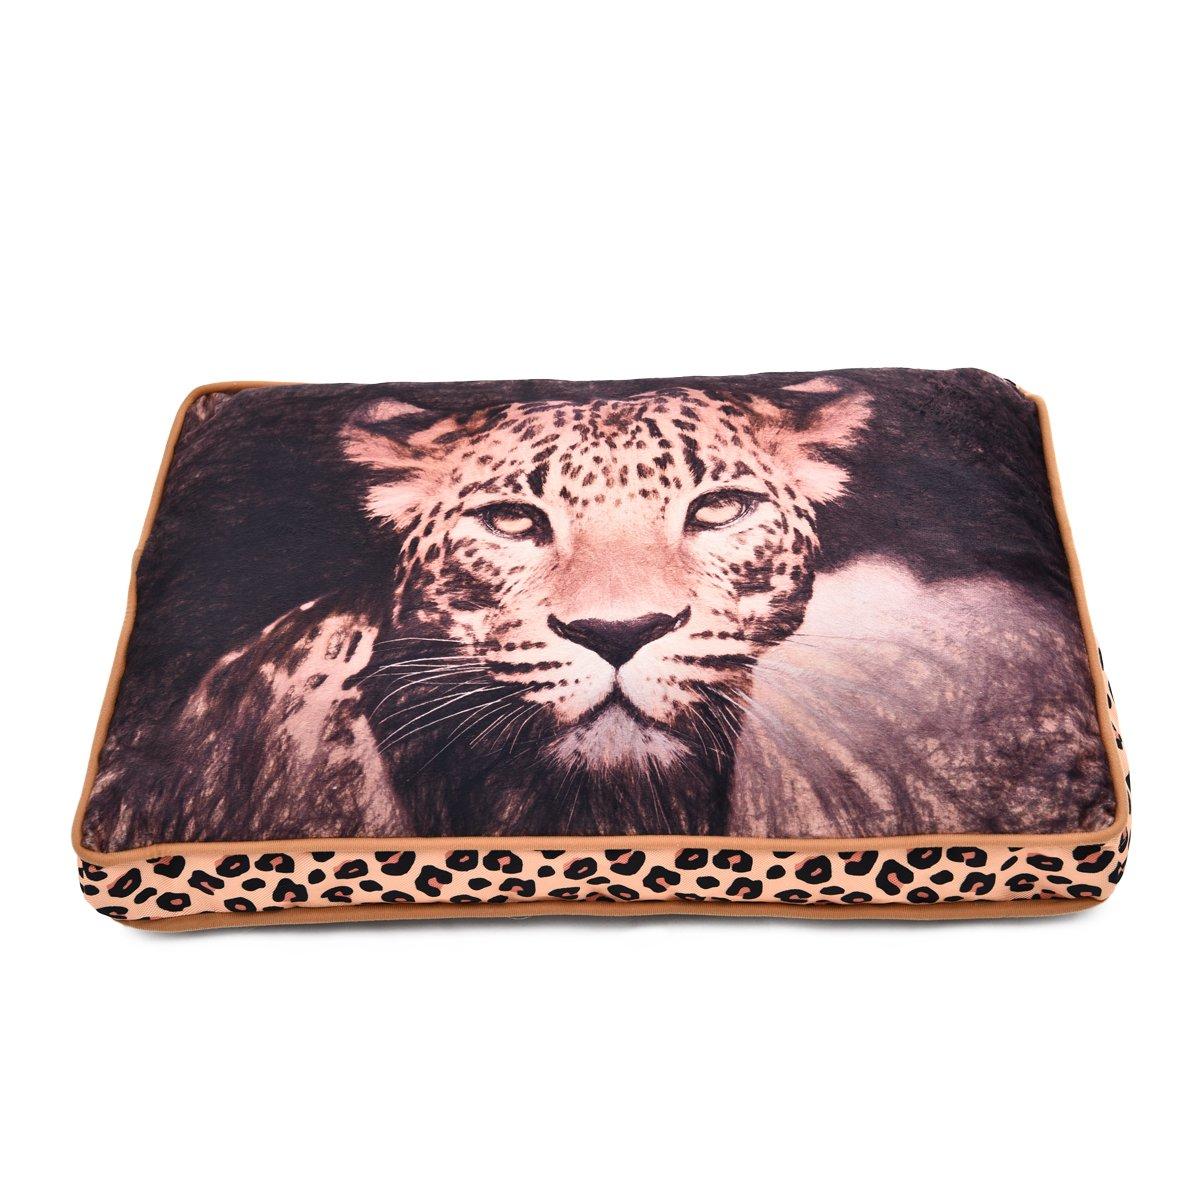 Animal Print Padded Pet Bolster Bed For Dog Cat Warm Puppy Kitten Cushions Fleece Mat Leopard Pattern Dog Beds Small(19.7''x13.8''x4.4'')